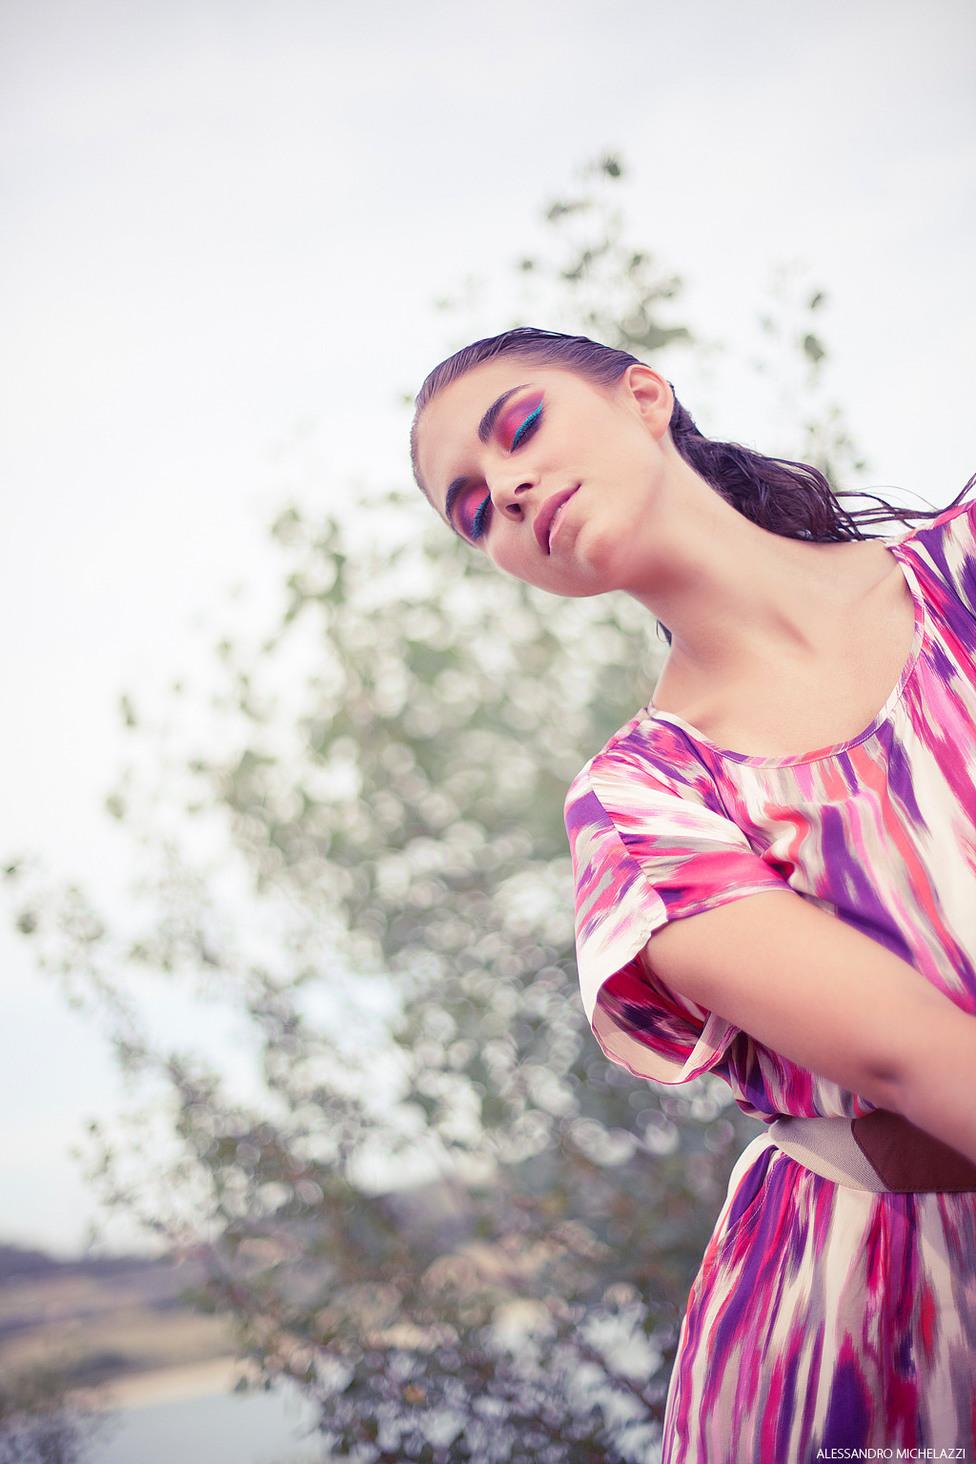 Fashion and portrait photo session at Bilancino Lake, Tuscany